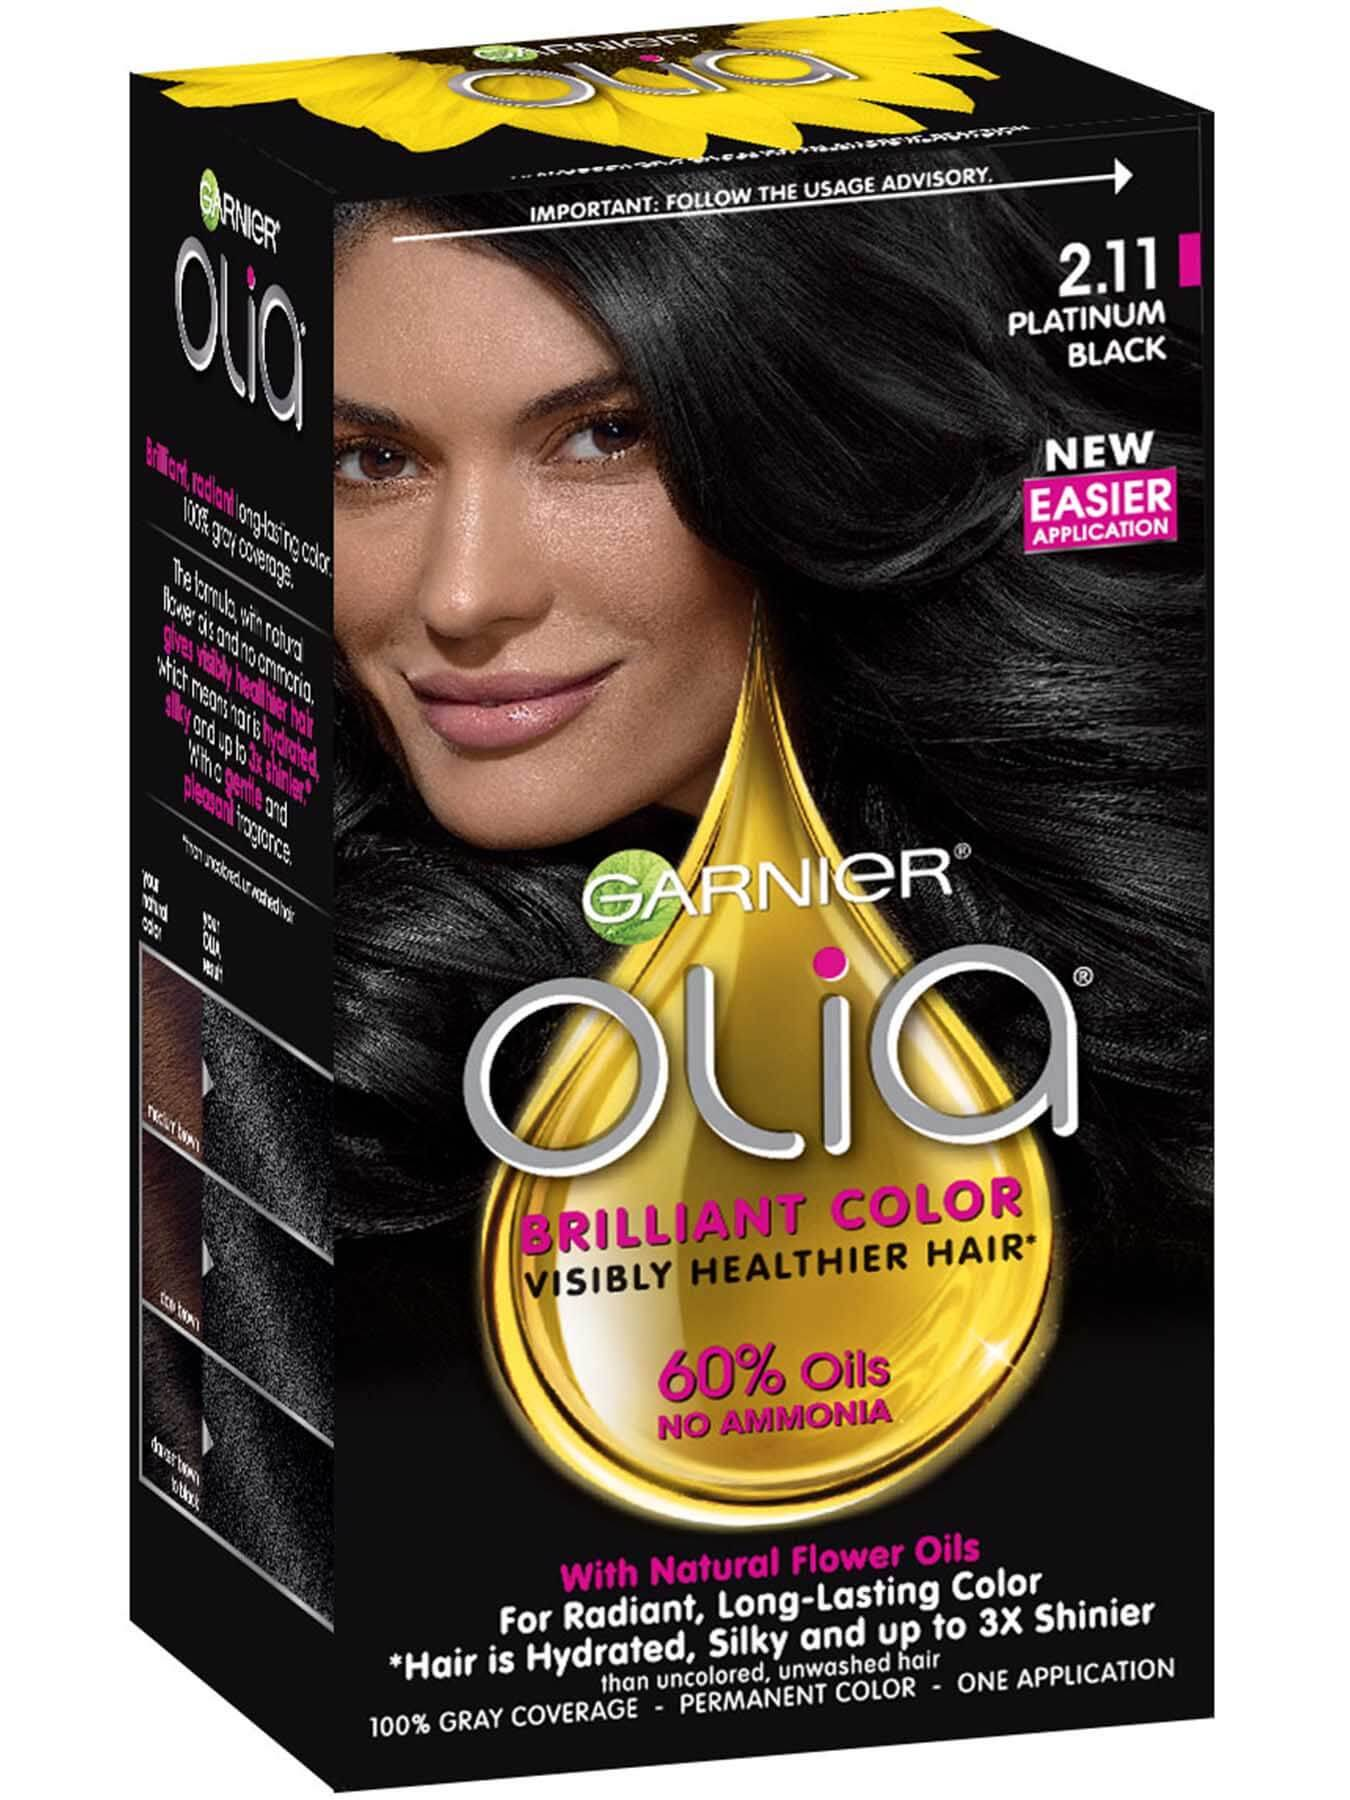 Permanent Semi Permanent Temporary Black Hair Color Garnier